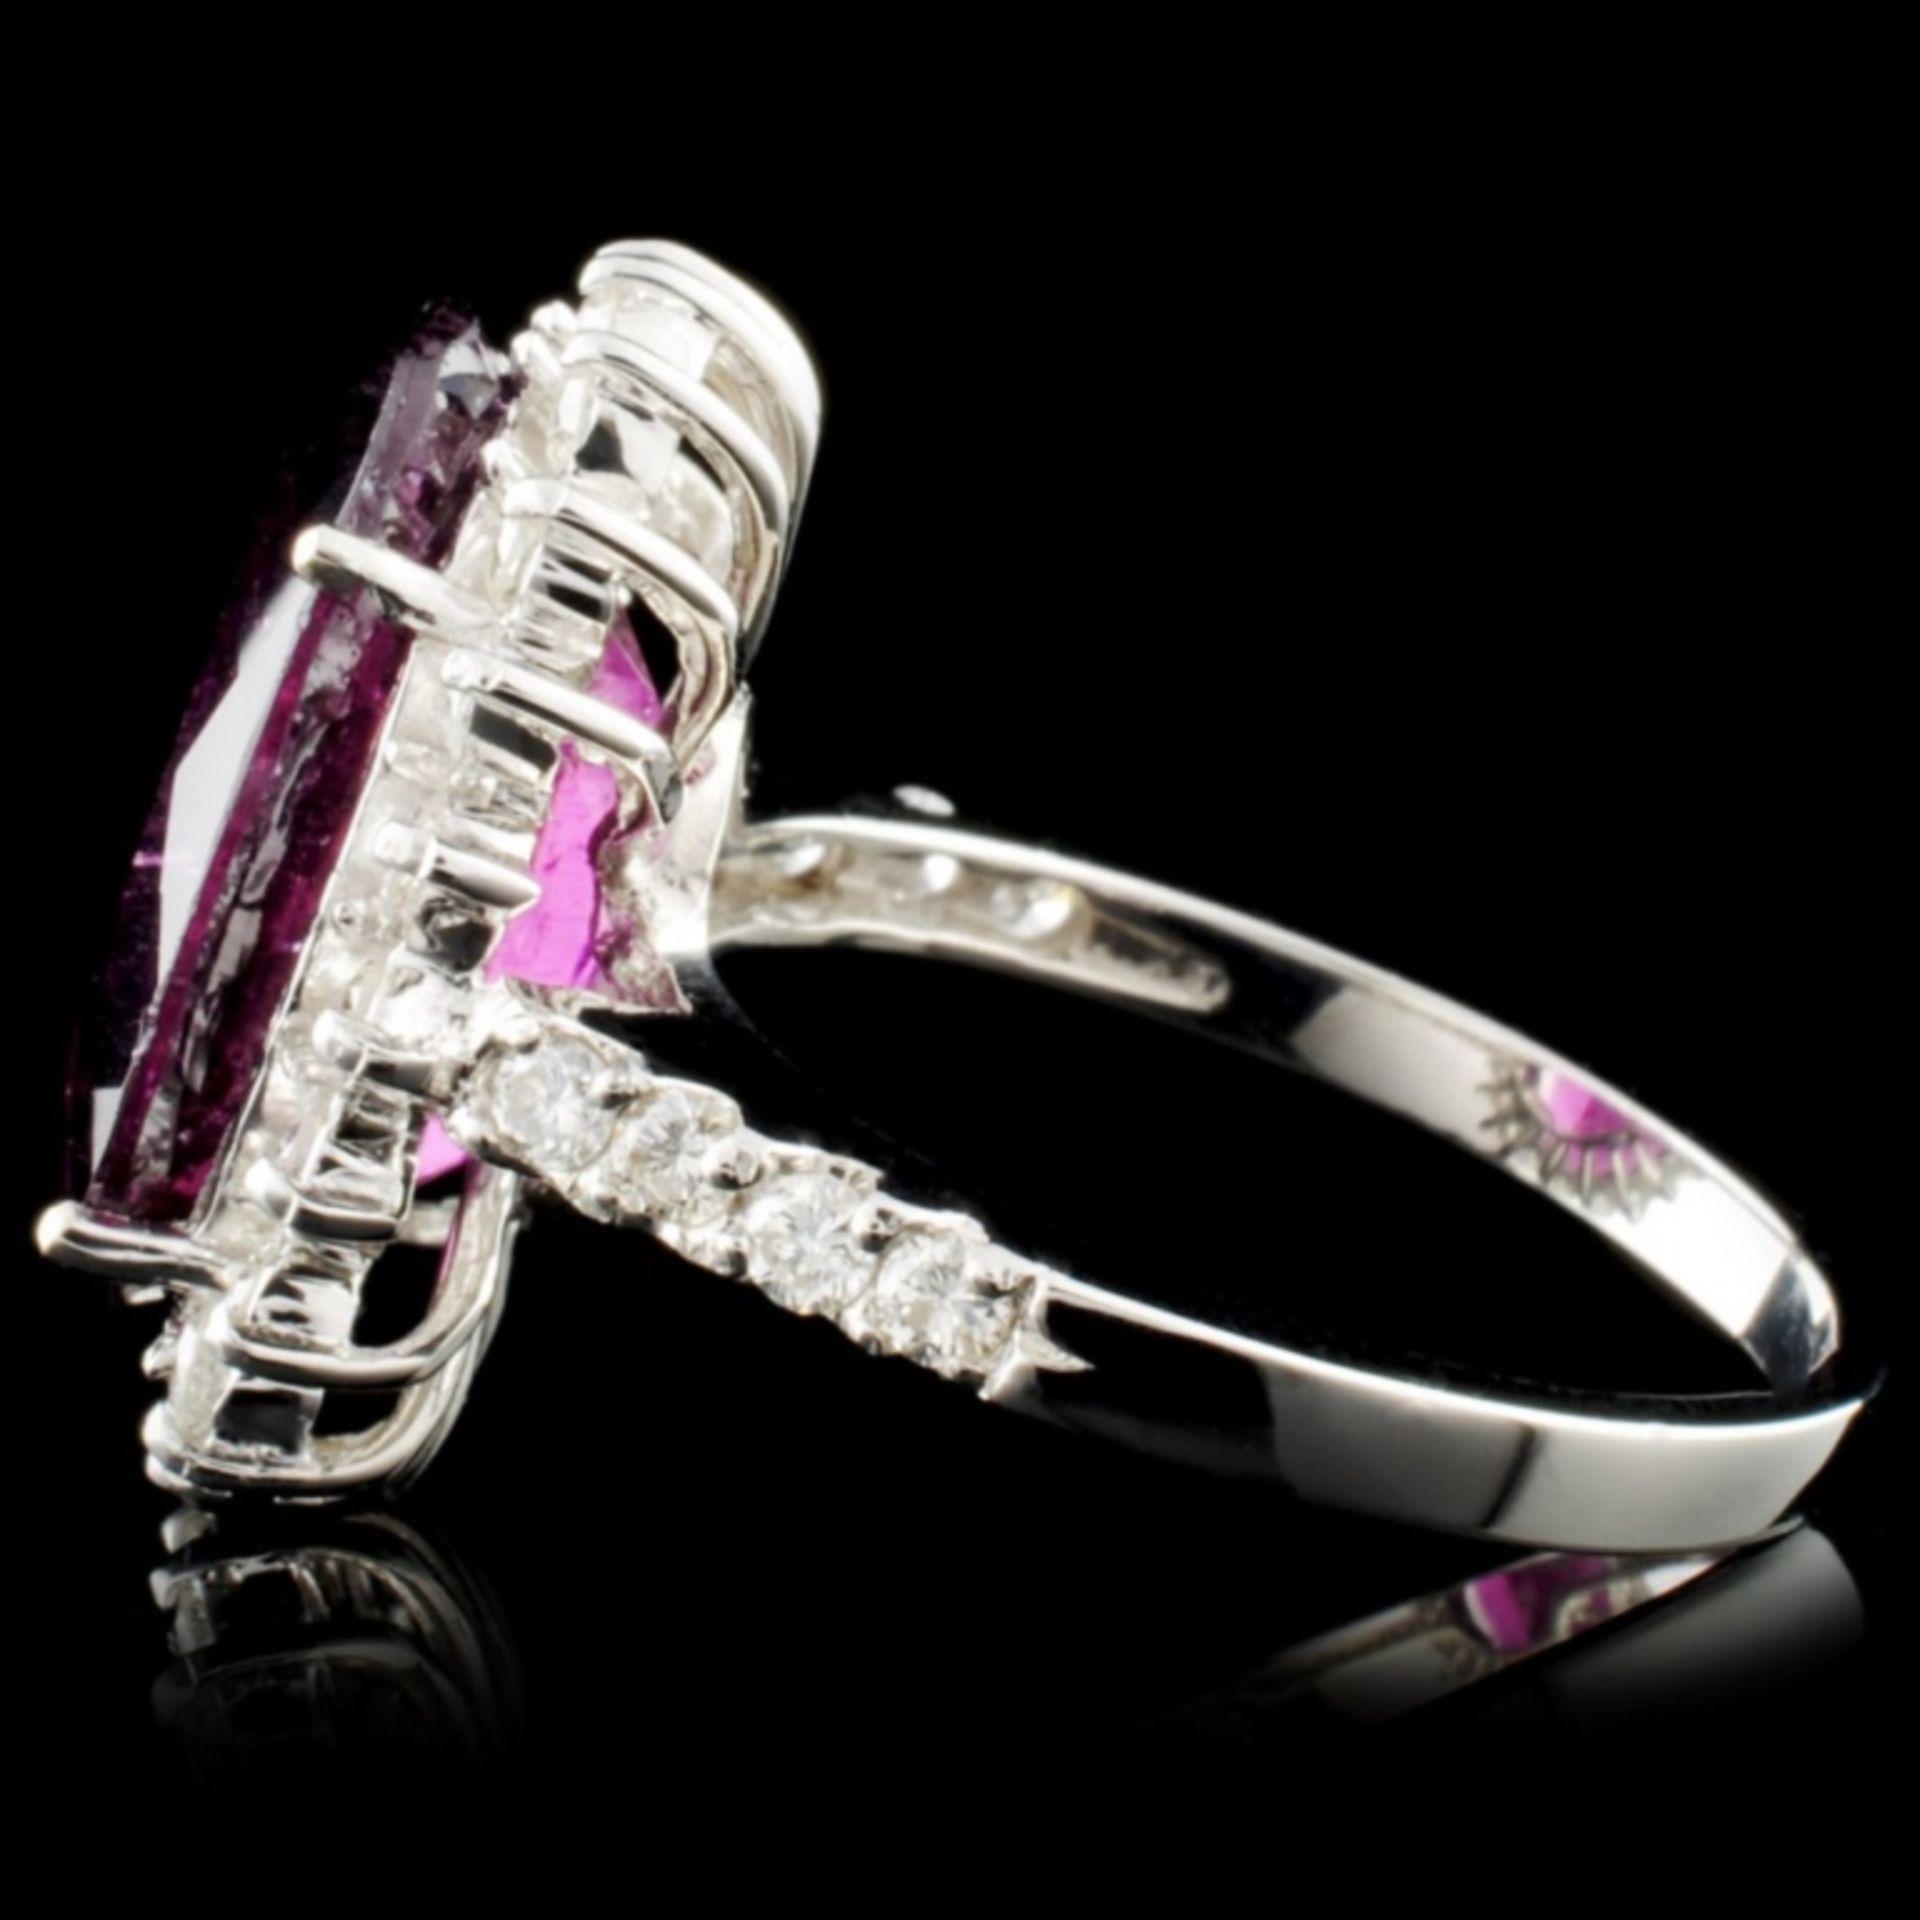 14K Gold 7.72ct Tourmaline & 0.81ctw Diamond Ring - Image 3 of 4